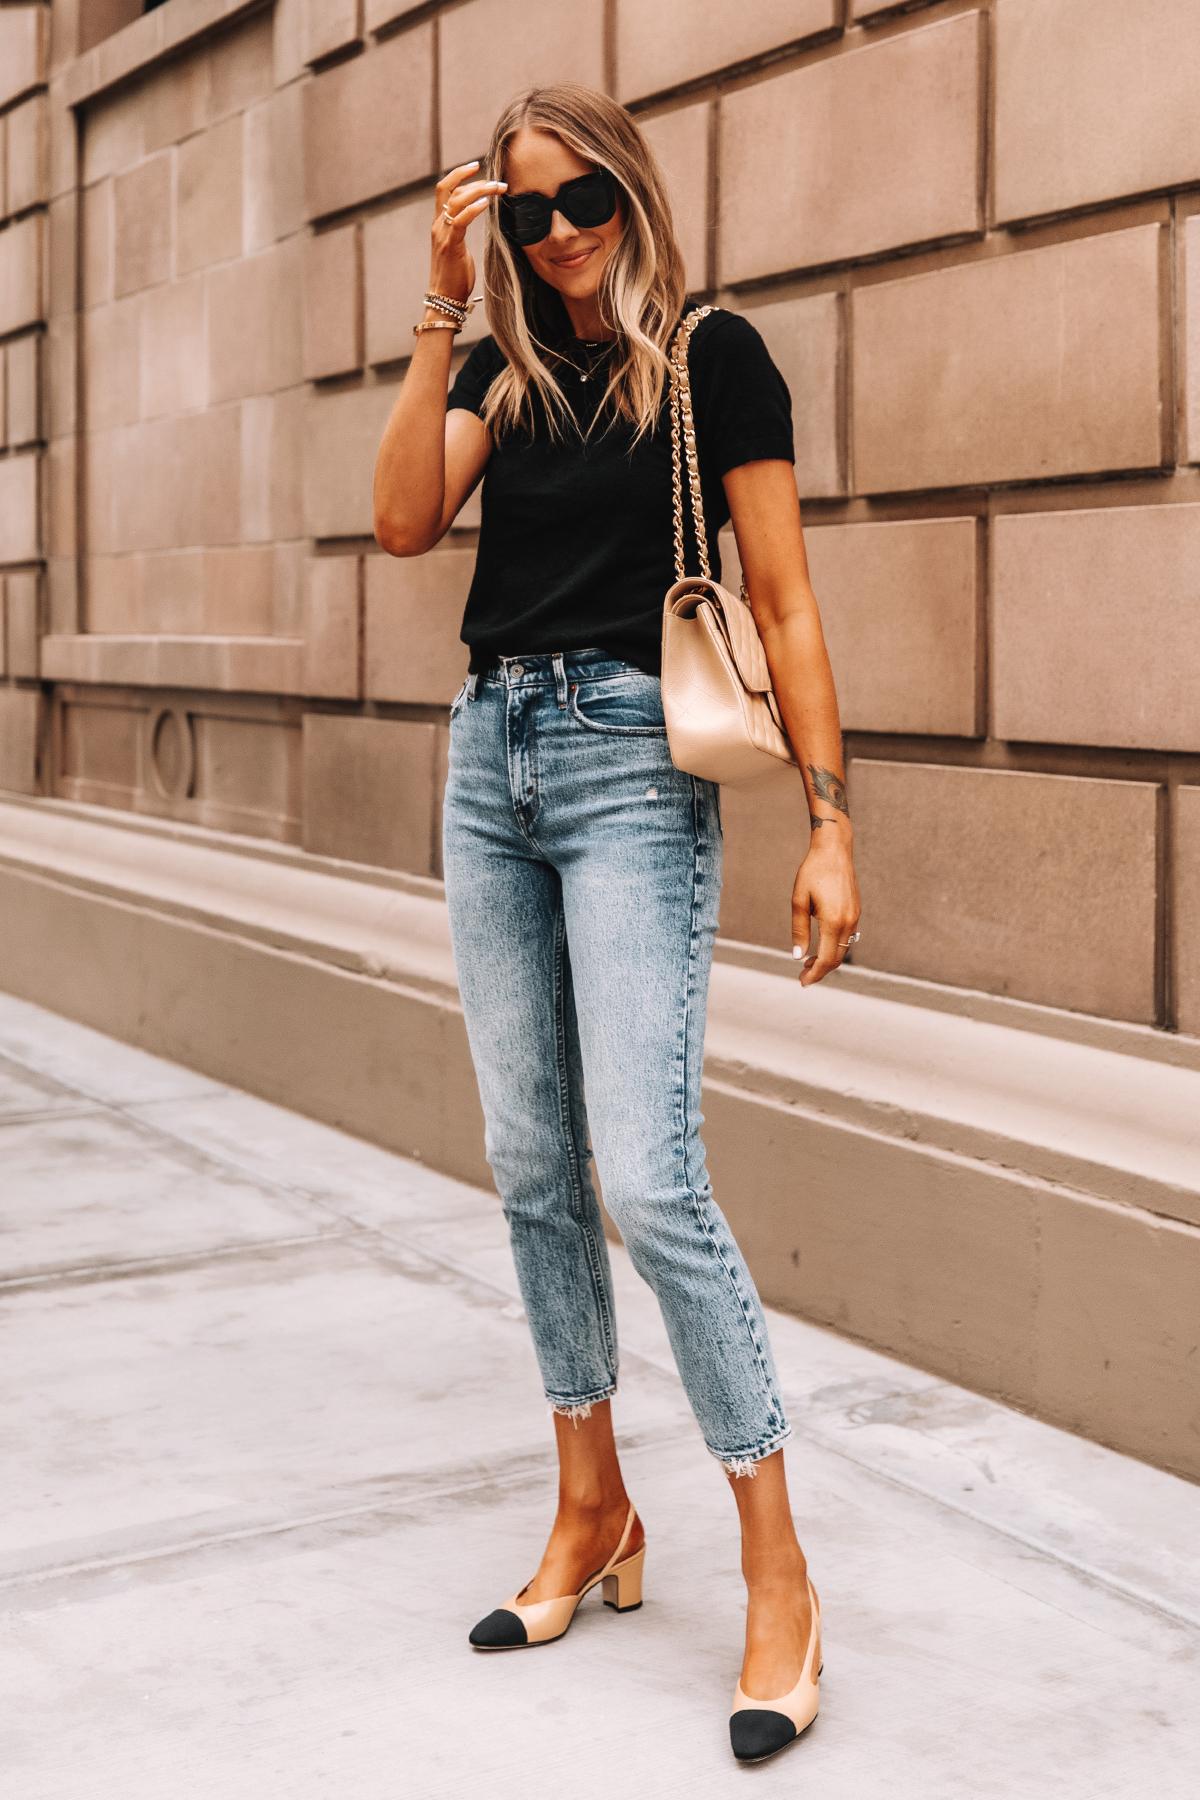 Fashion Jackson Wearing Short Sleeve Black Sweater High Rise Jeans Chanel Slingbacks Chanel Beige Jumbo Handbag